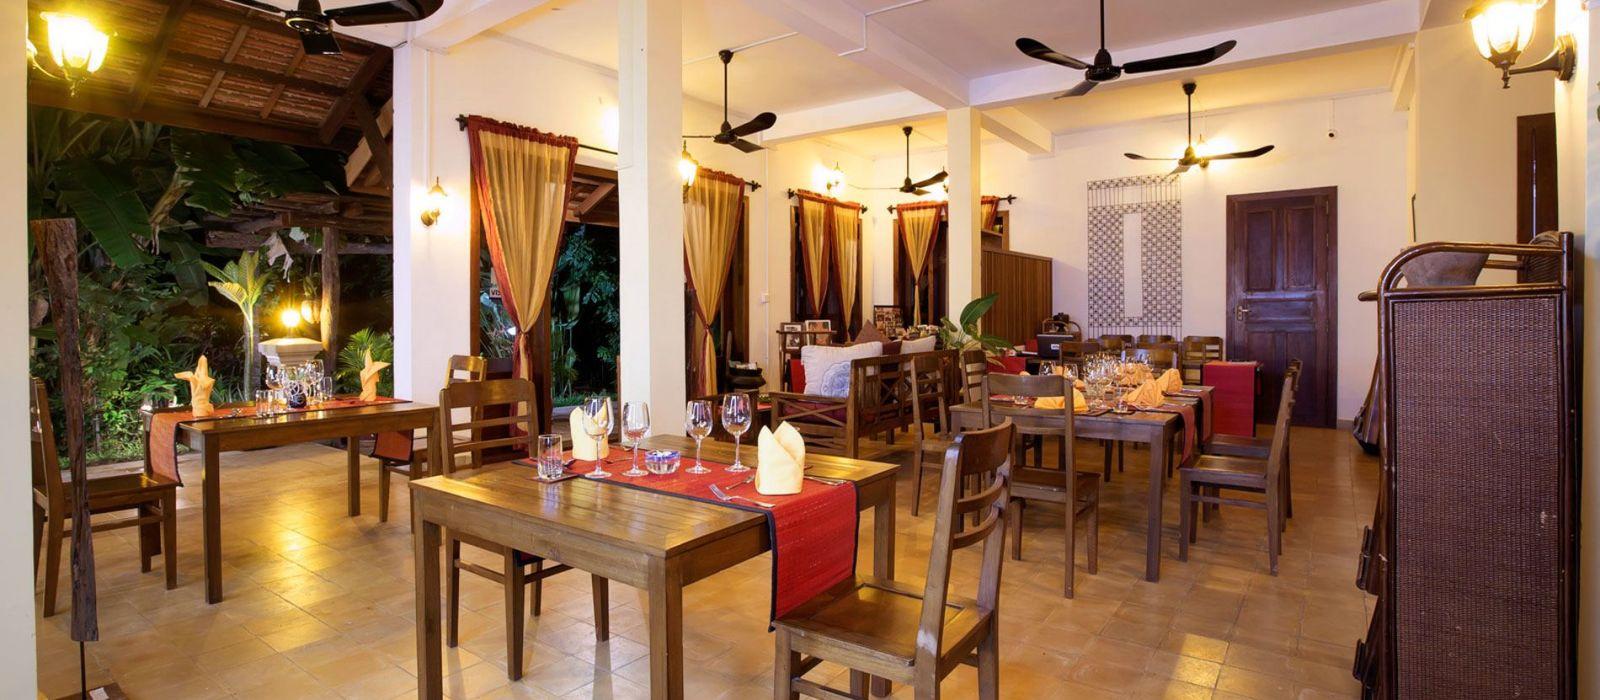 Hotel Maisons Wat Kor Cambodia